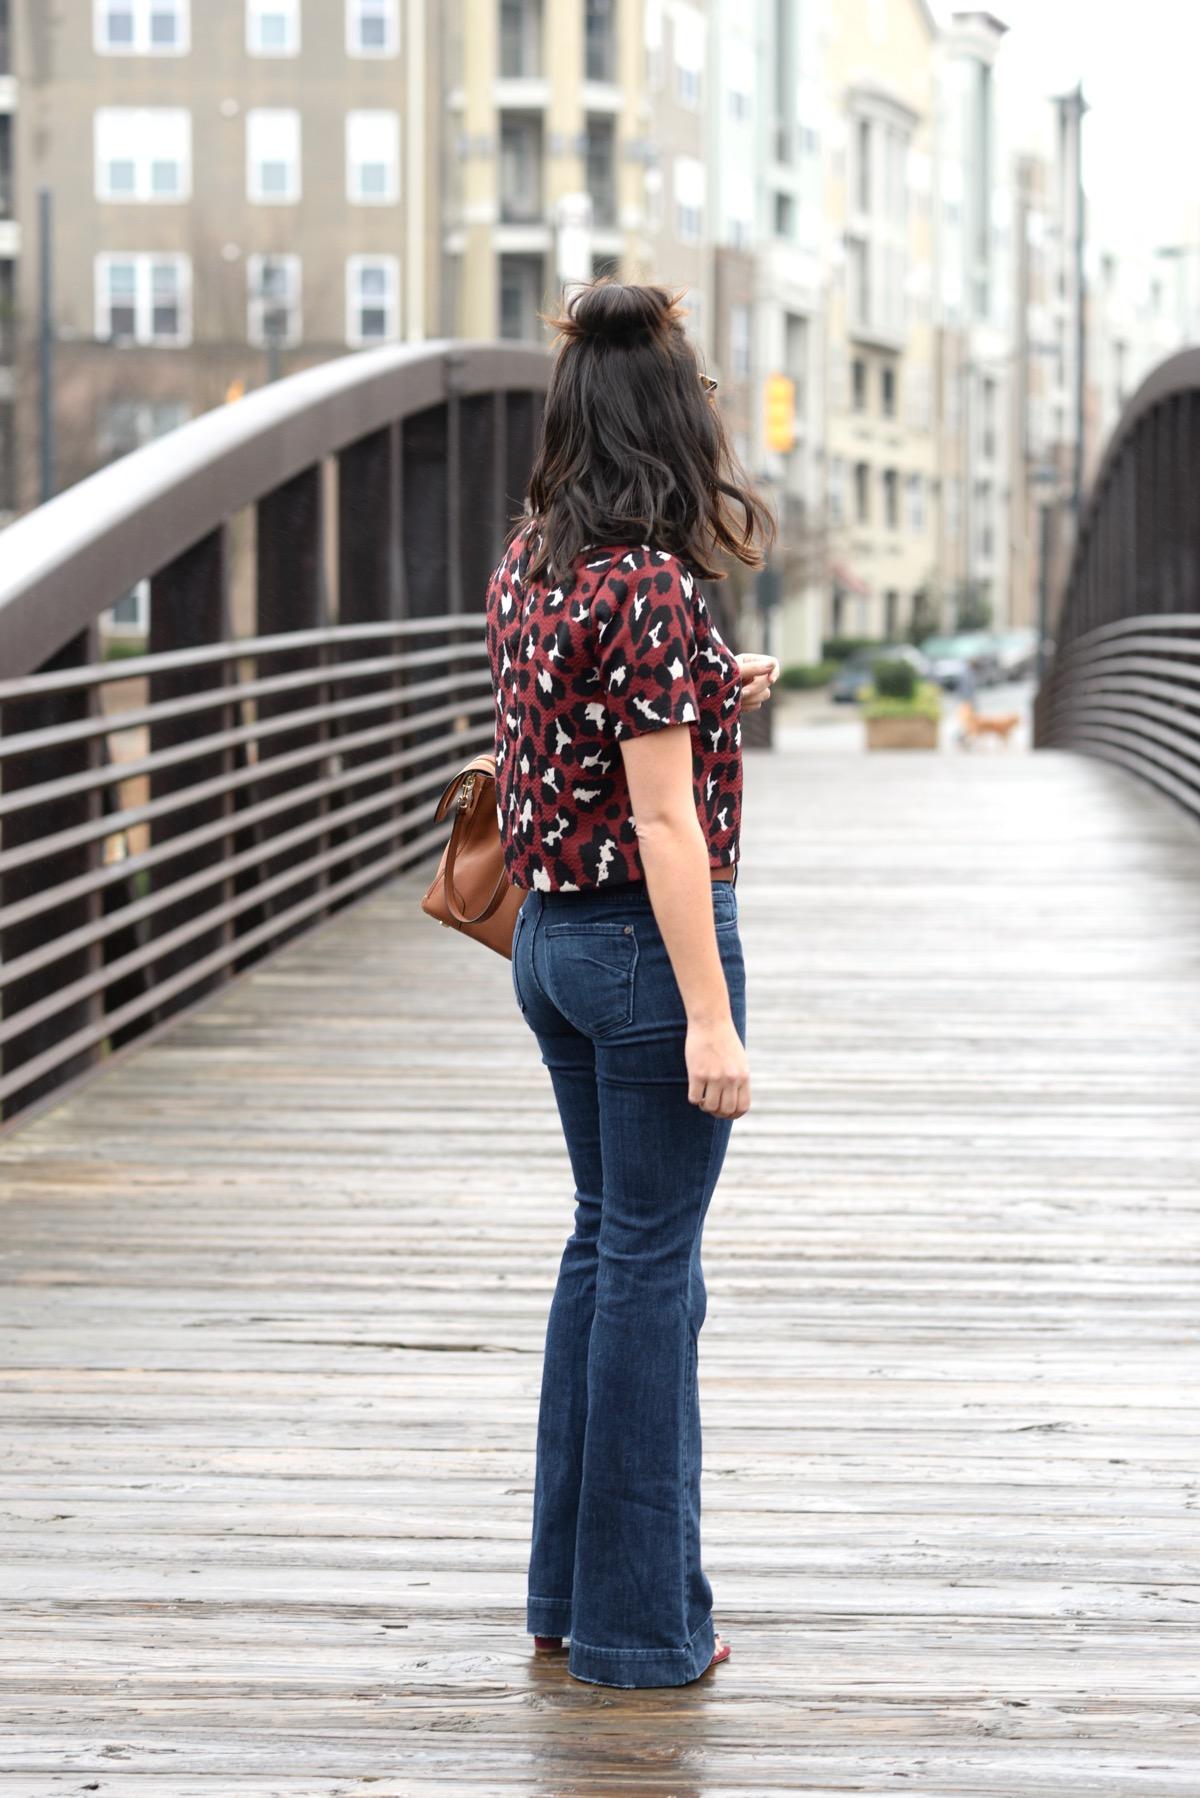 L. Mae Boutique Leopard Crop Top and Wide Leg Jeans - @mystylevita